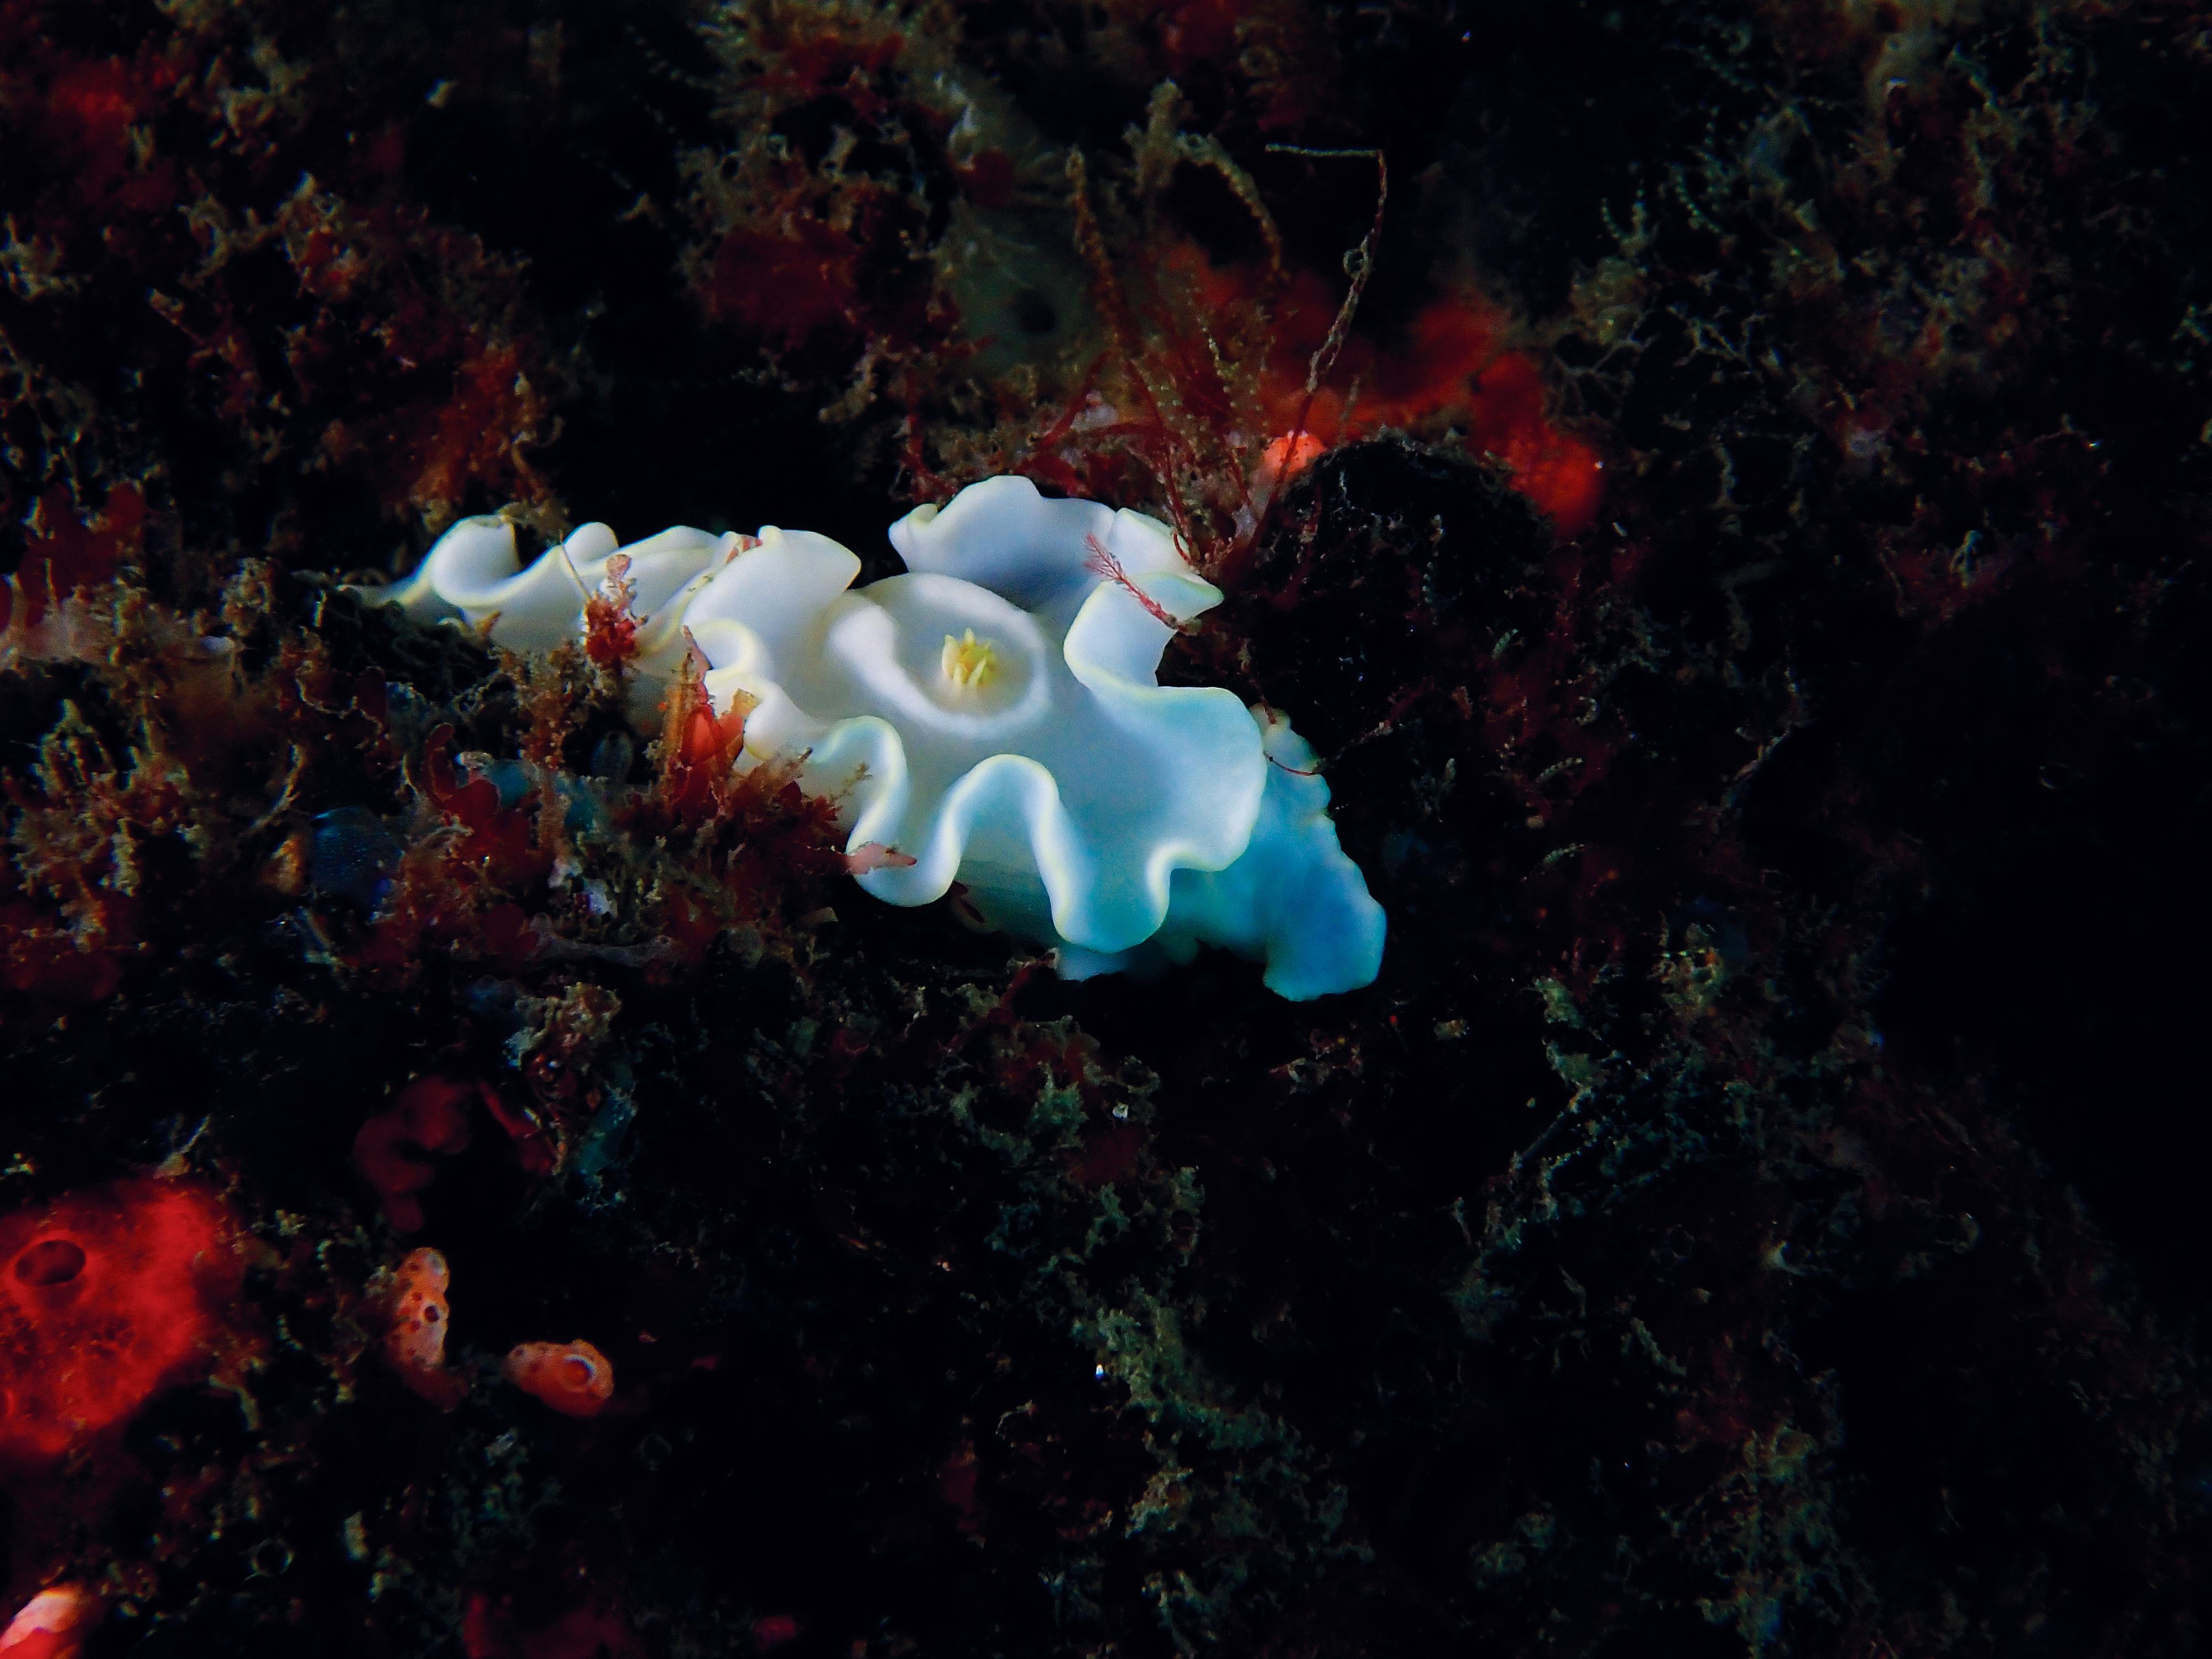 Philip Wong - 鋤頭魚海蝕洞外圍 - 蒼白多彩海蛞蝓